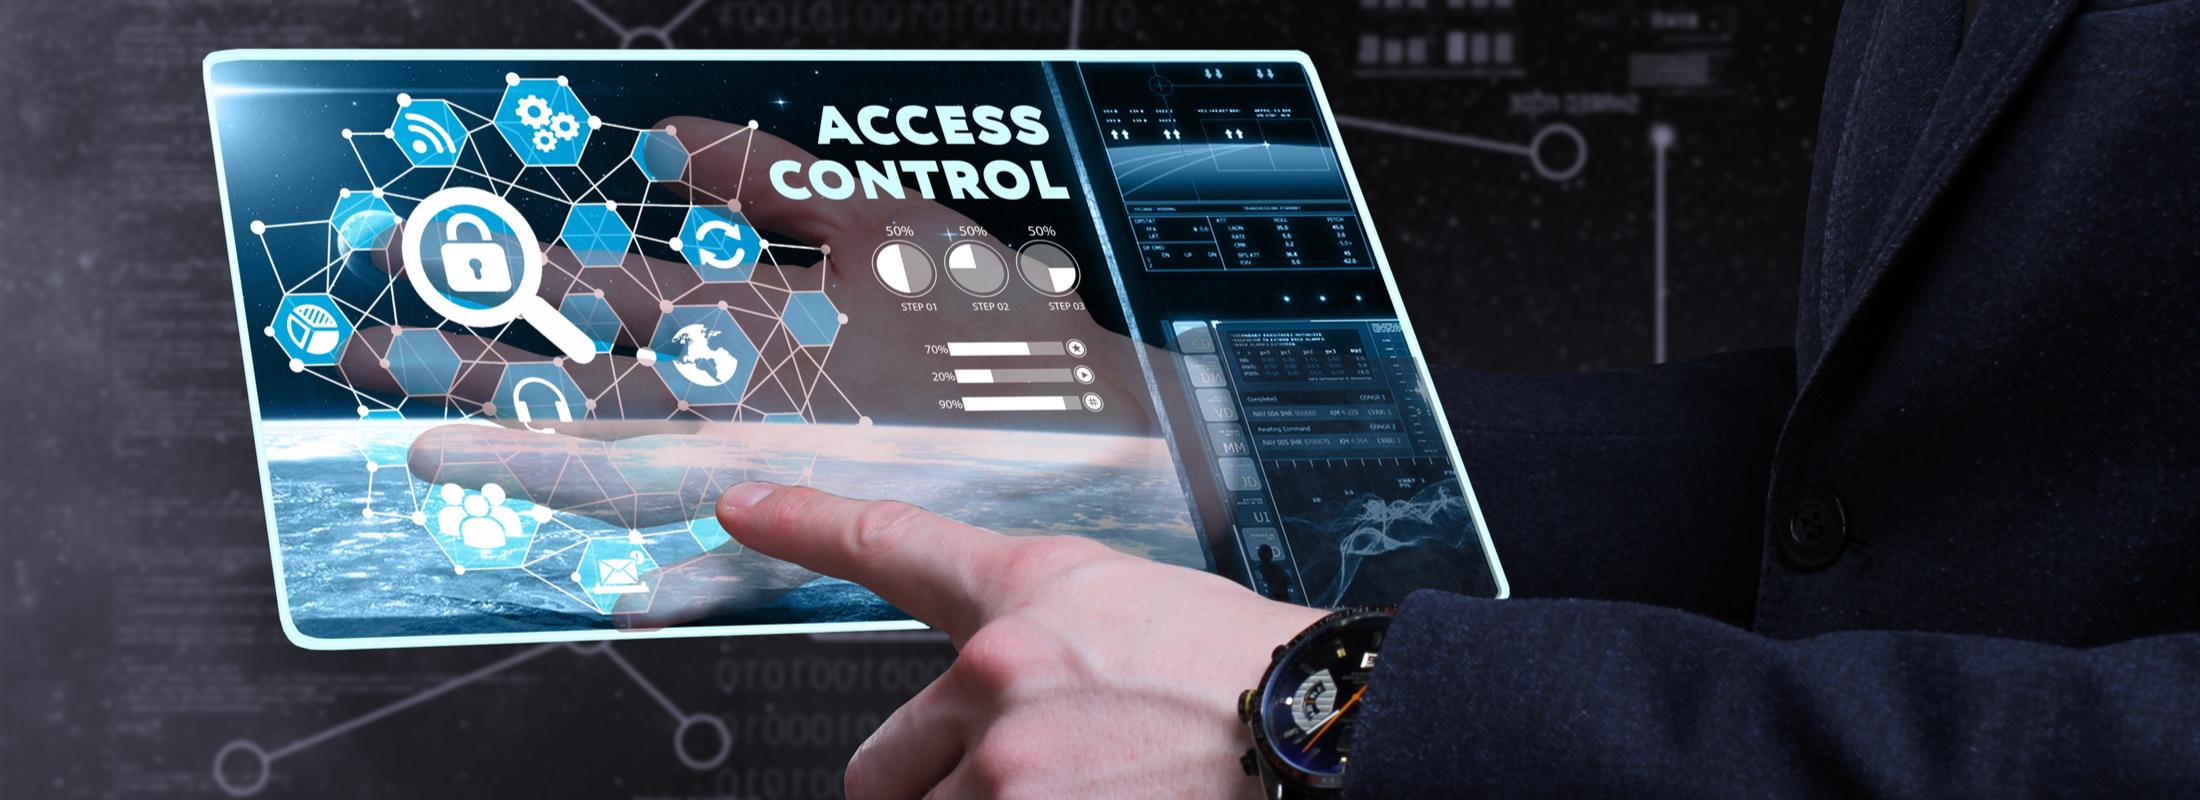 Future of Access Control